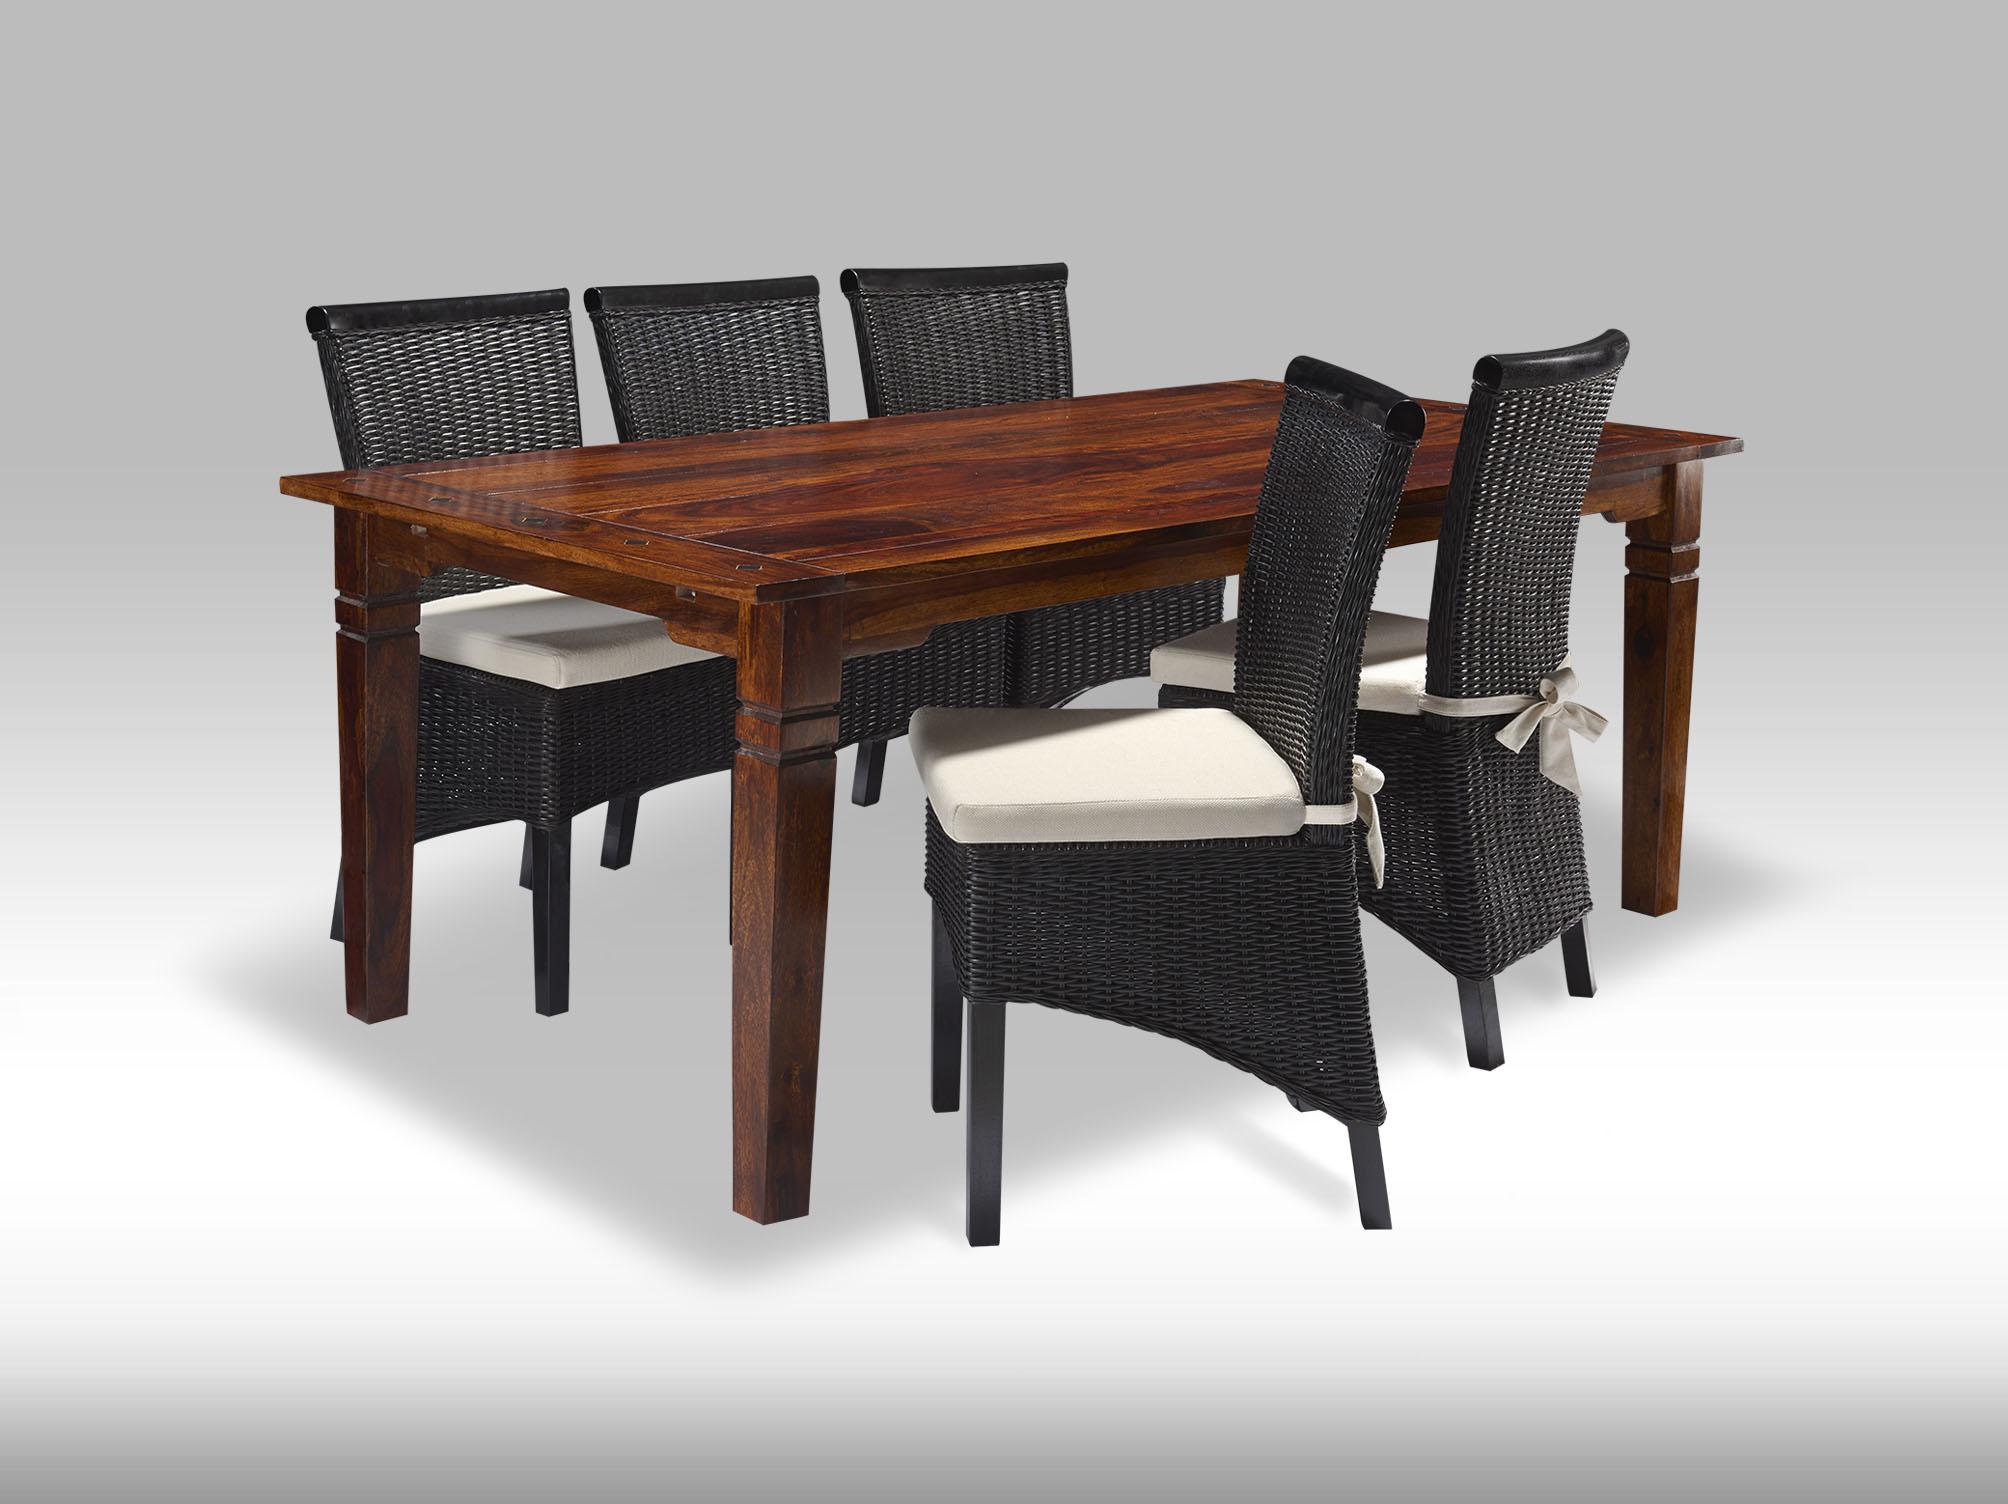 Fint Sheesham bord med seks tilhørerende stole.